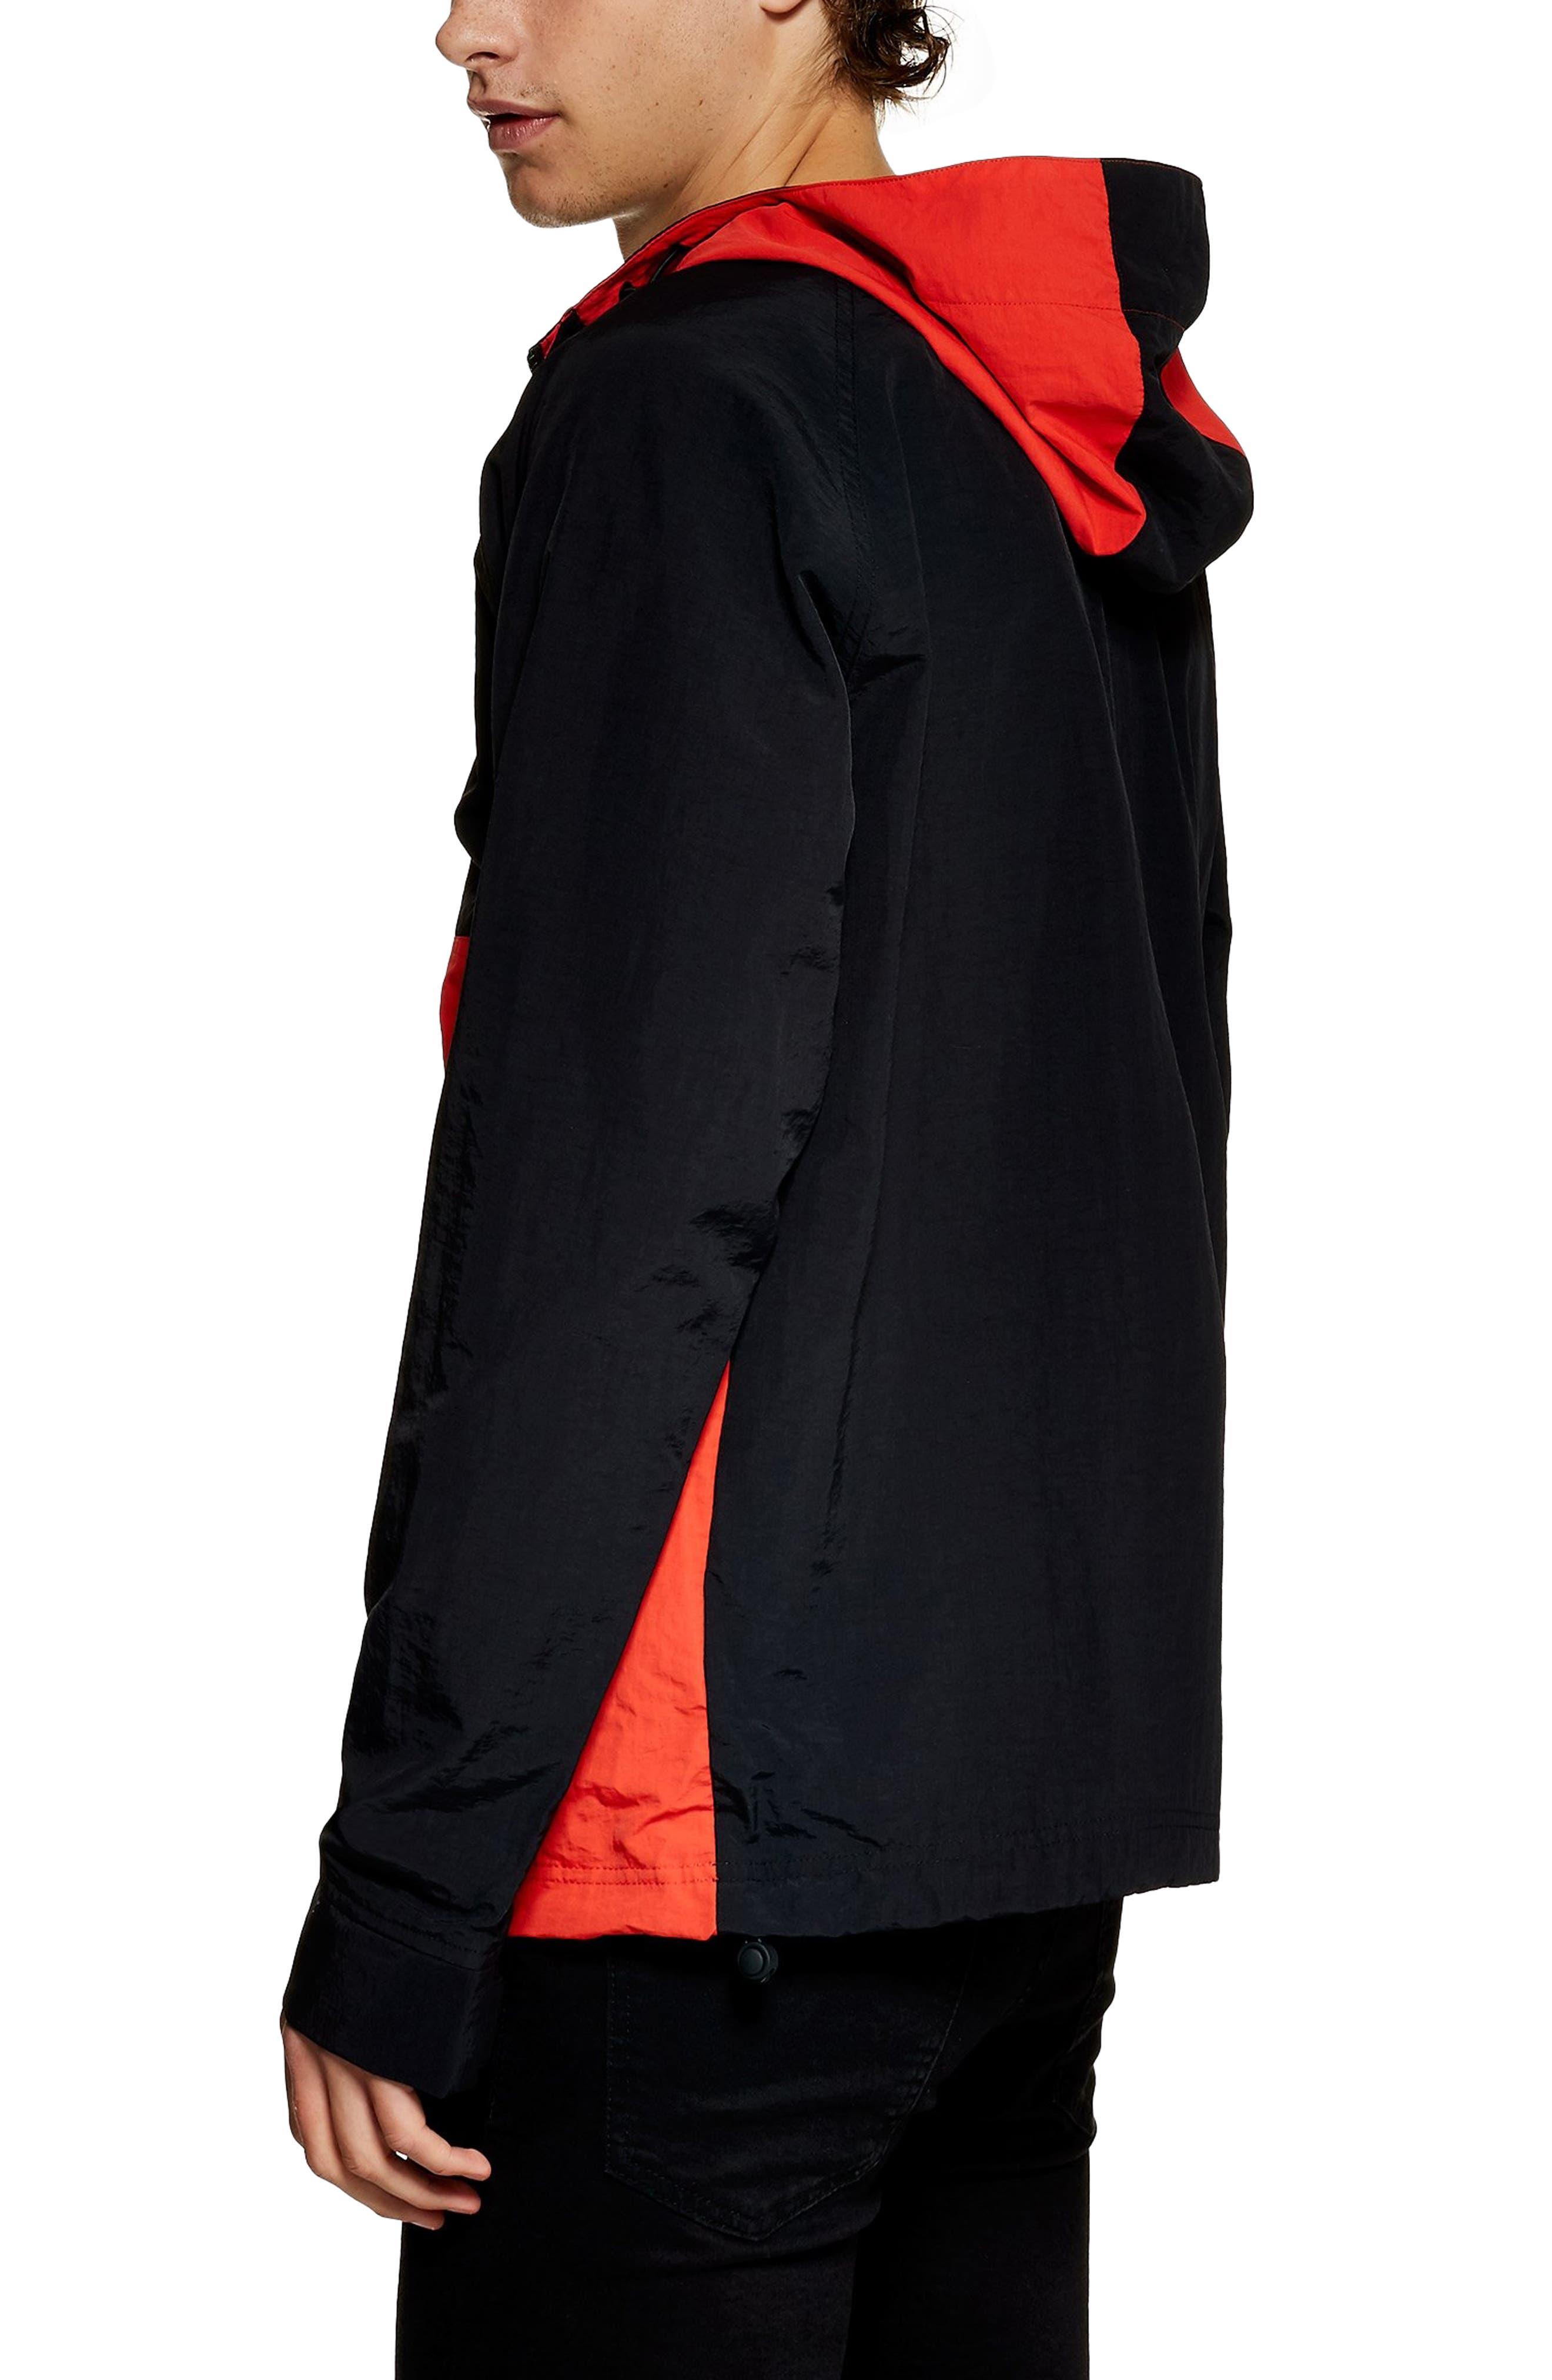 TOPMAN, Hooded Quarter Zip Windbreaker, Alternate thumbnail 2, color, RED MULTI